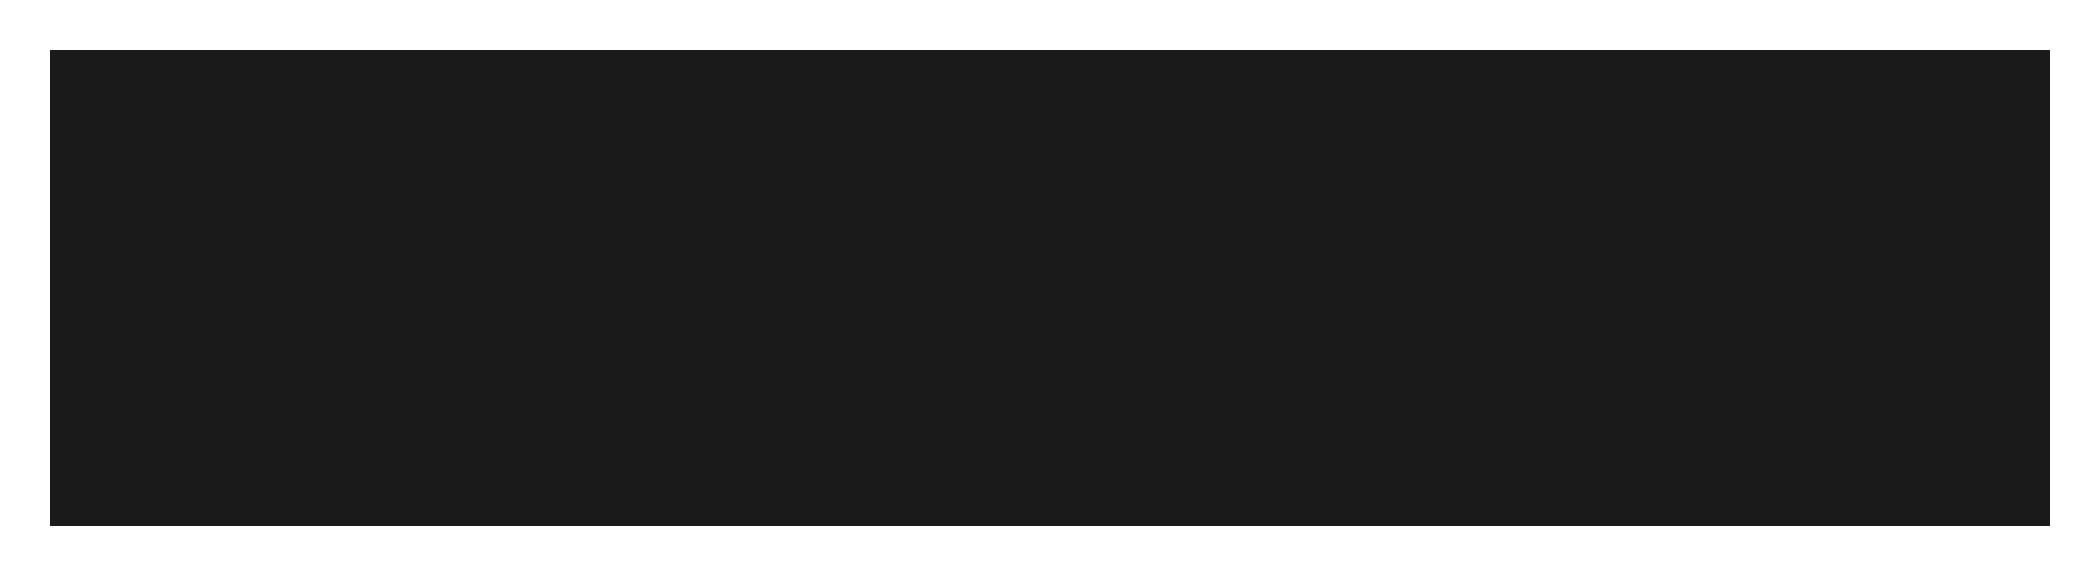 Swello.com